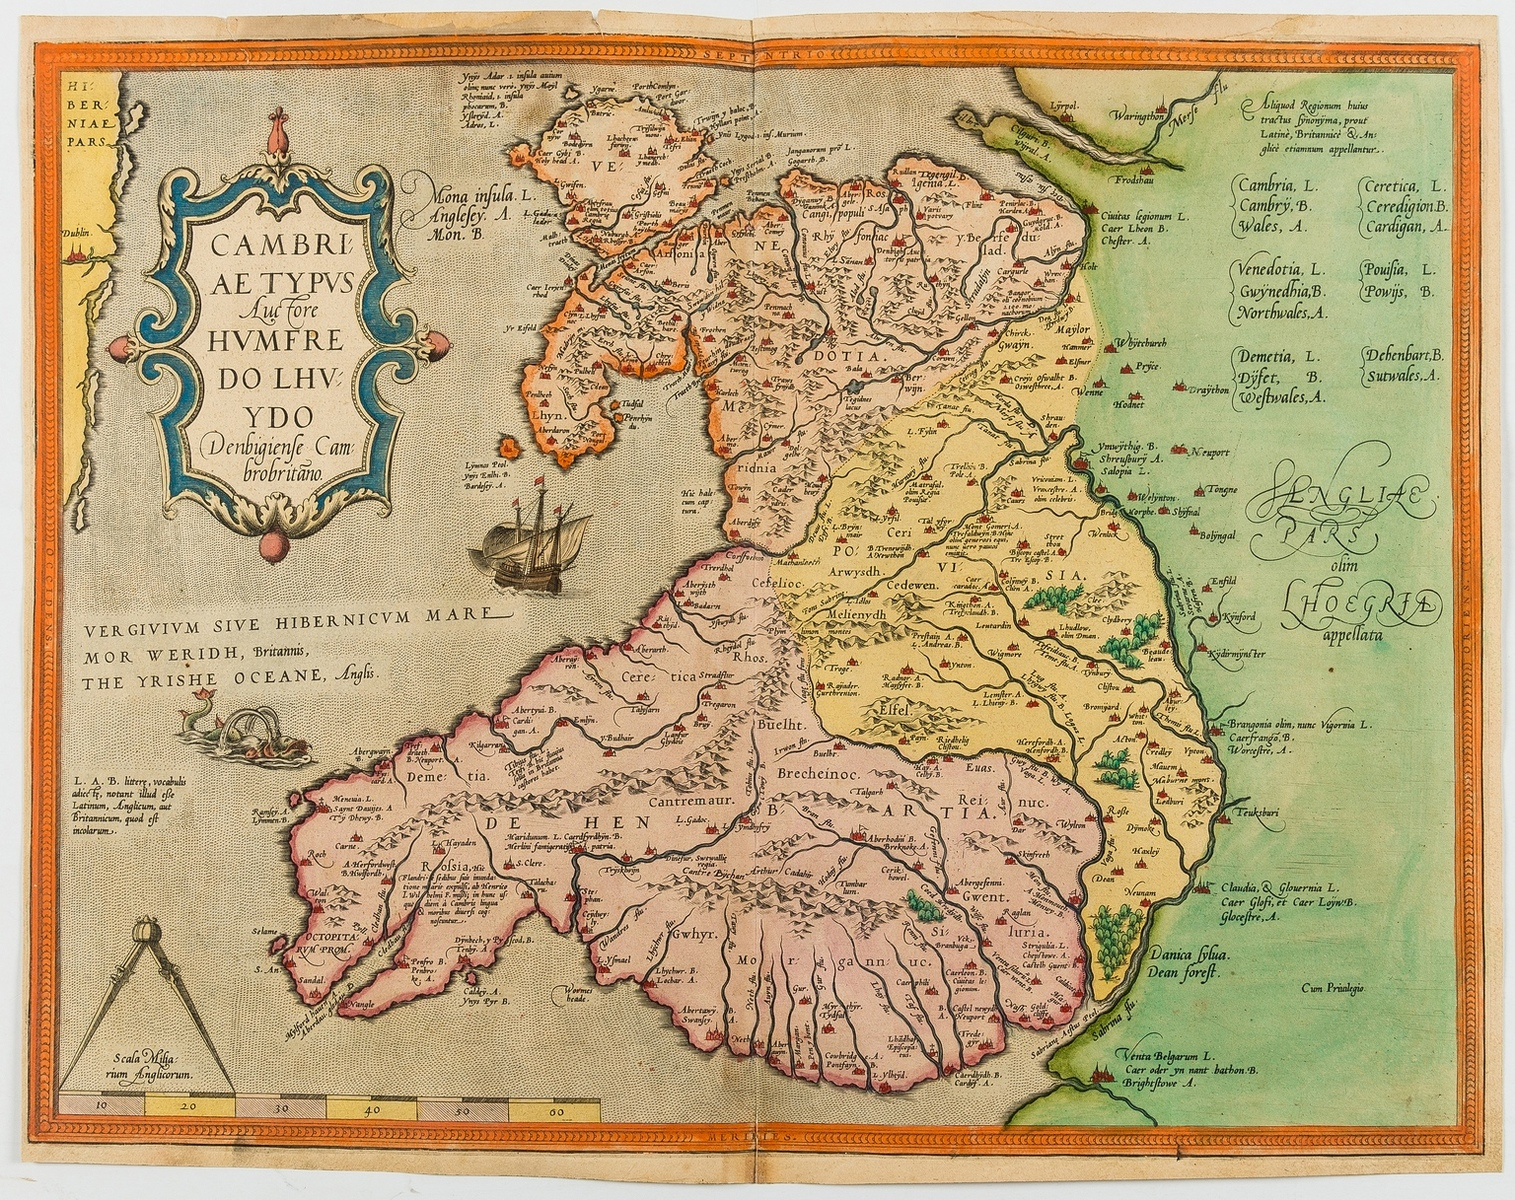 Wales.- Ortelius (Abraham) Cambriae Typus Auctore Humfredo Lhuydo Denbigiense Cambrobritano, [c. …